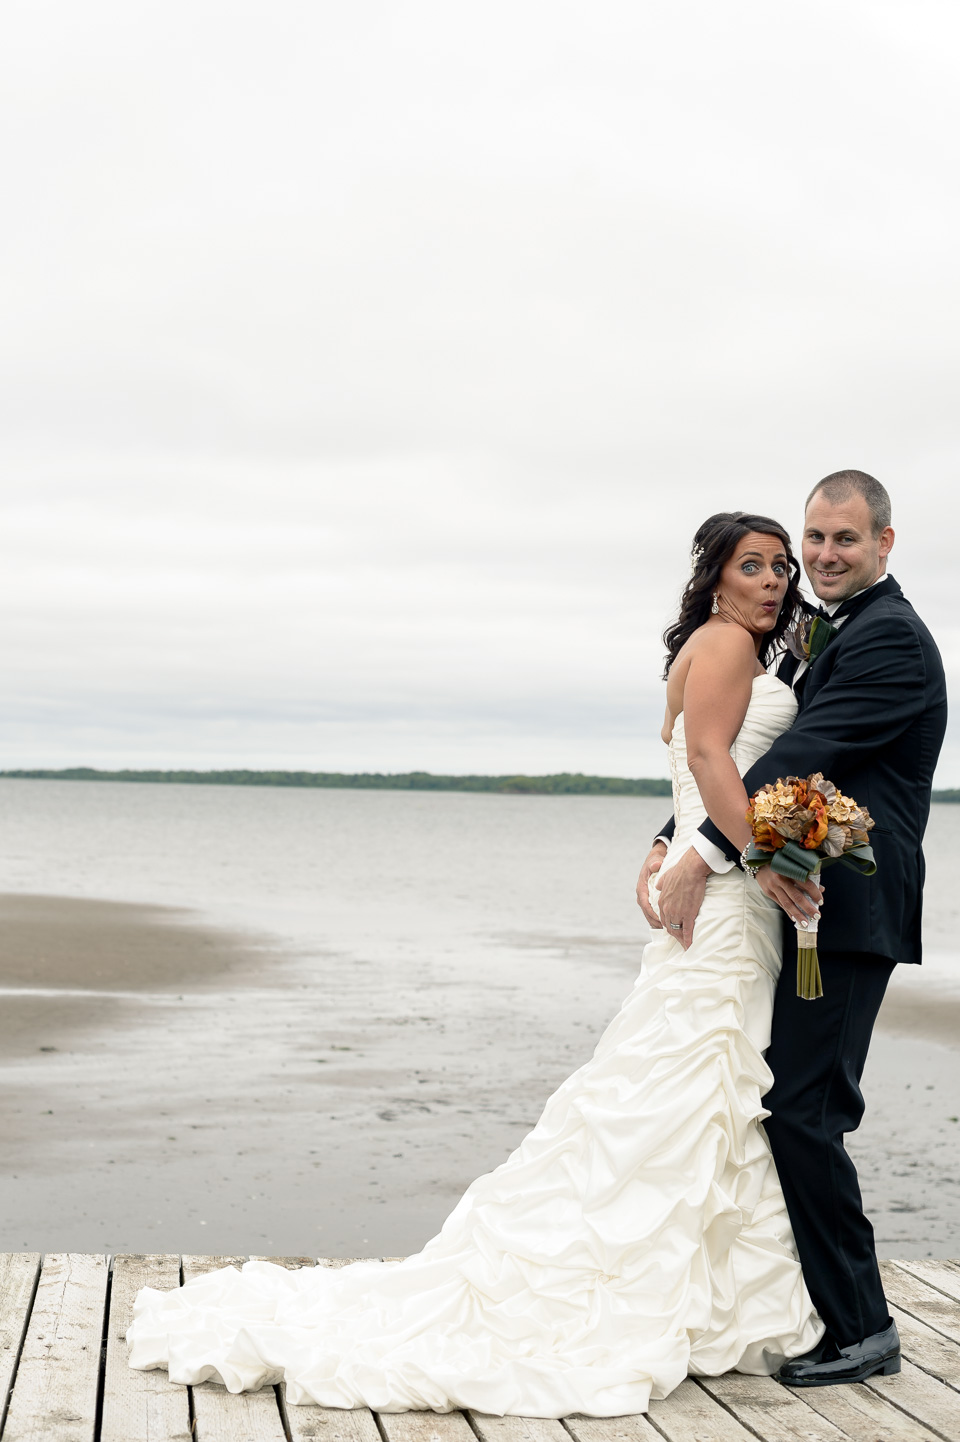 NIgel Fearon Photography | The LeBlanc Wedding-45.jpg